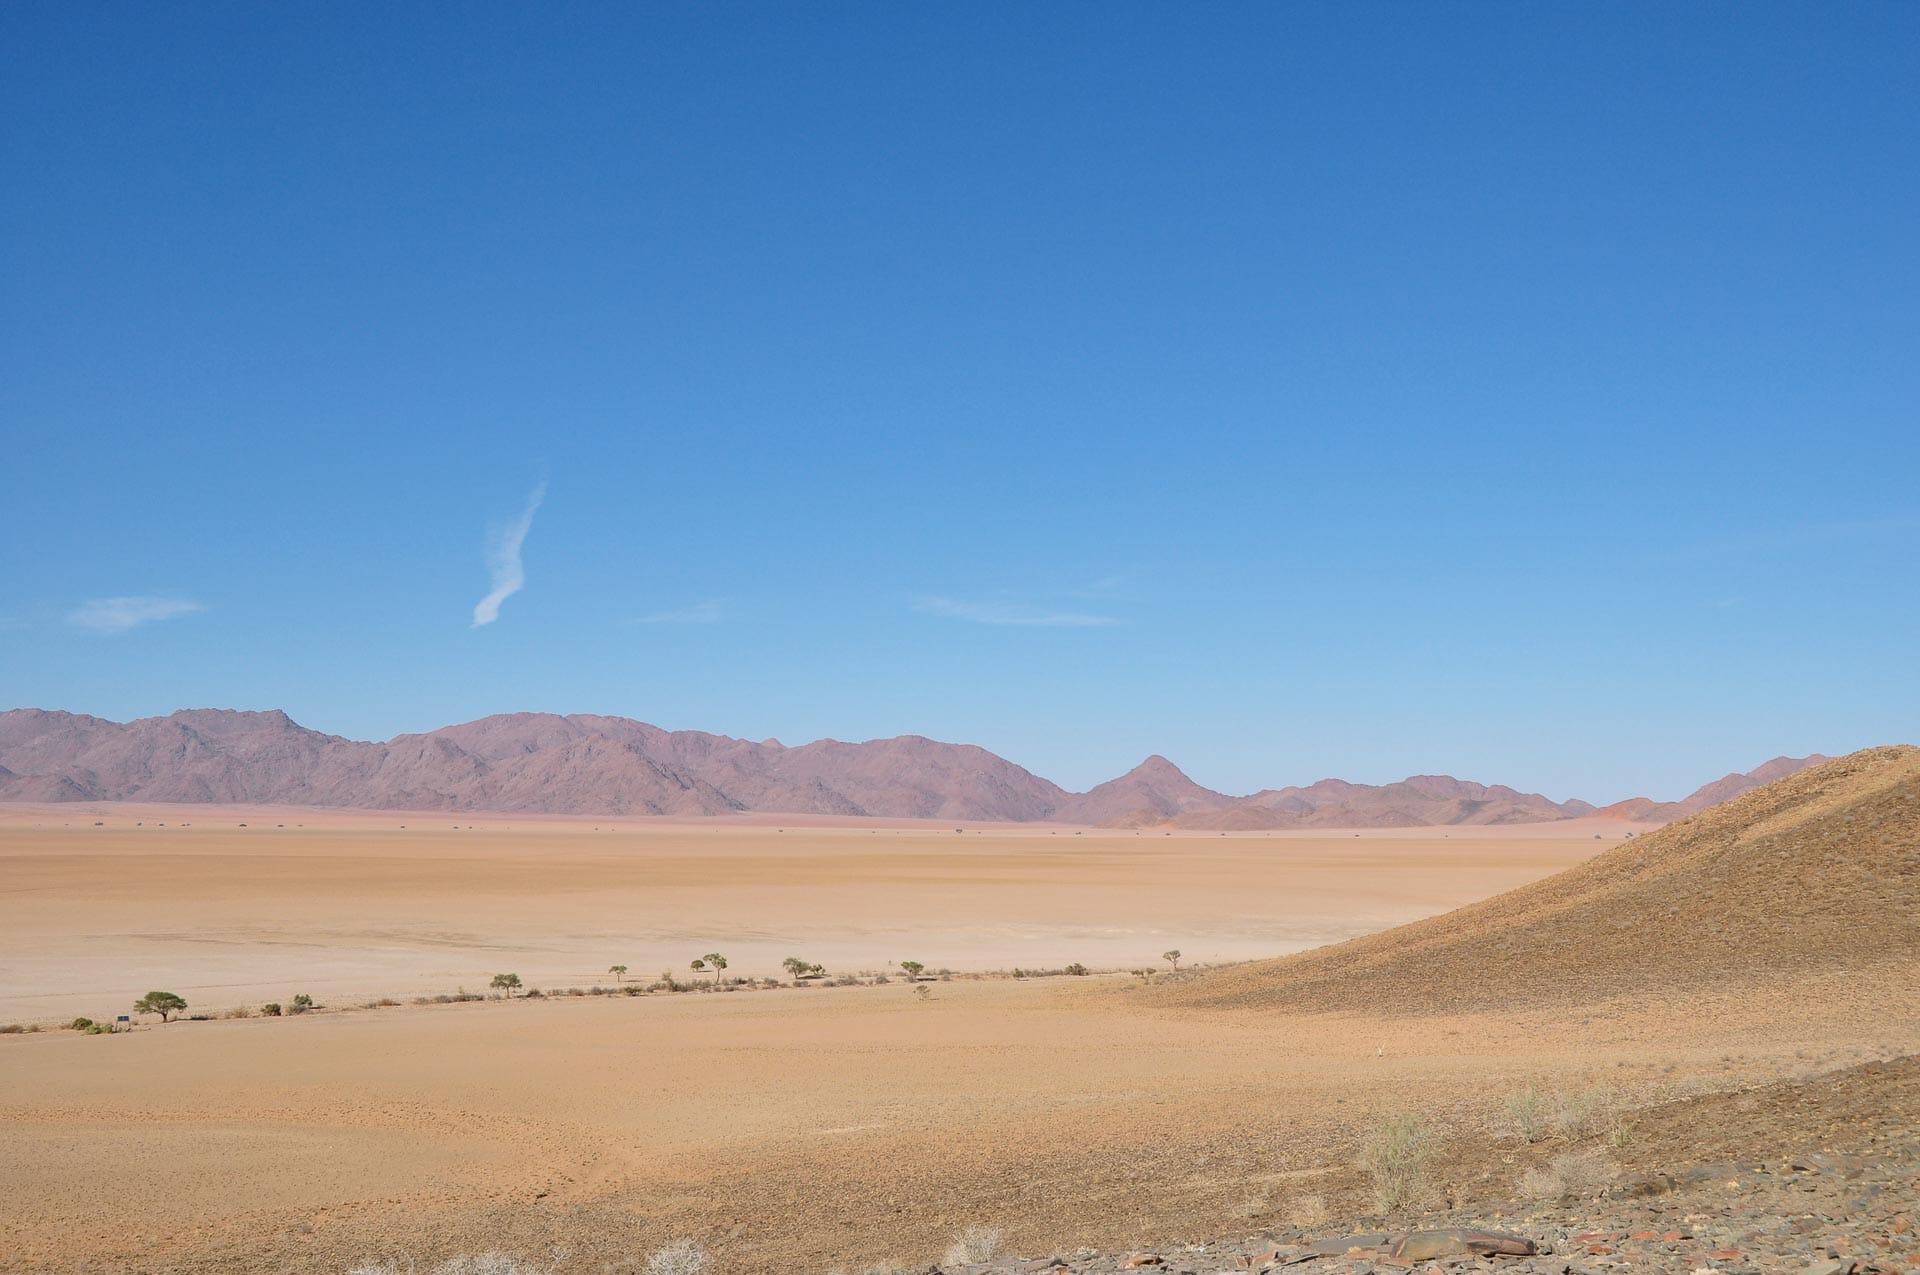 Kanaan-Desert-Retreat-Namibia-Globetrotter-Select-43